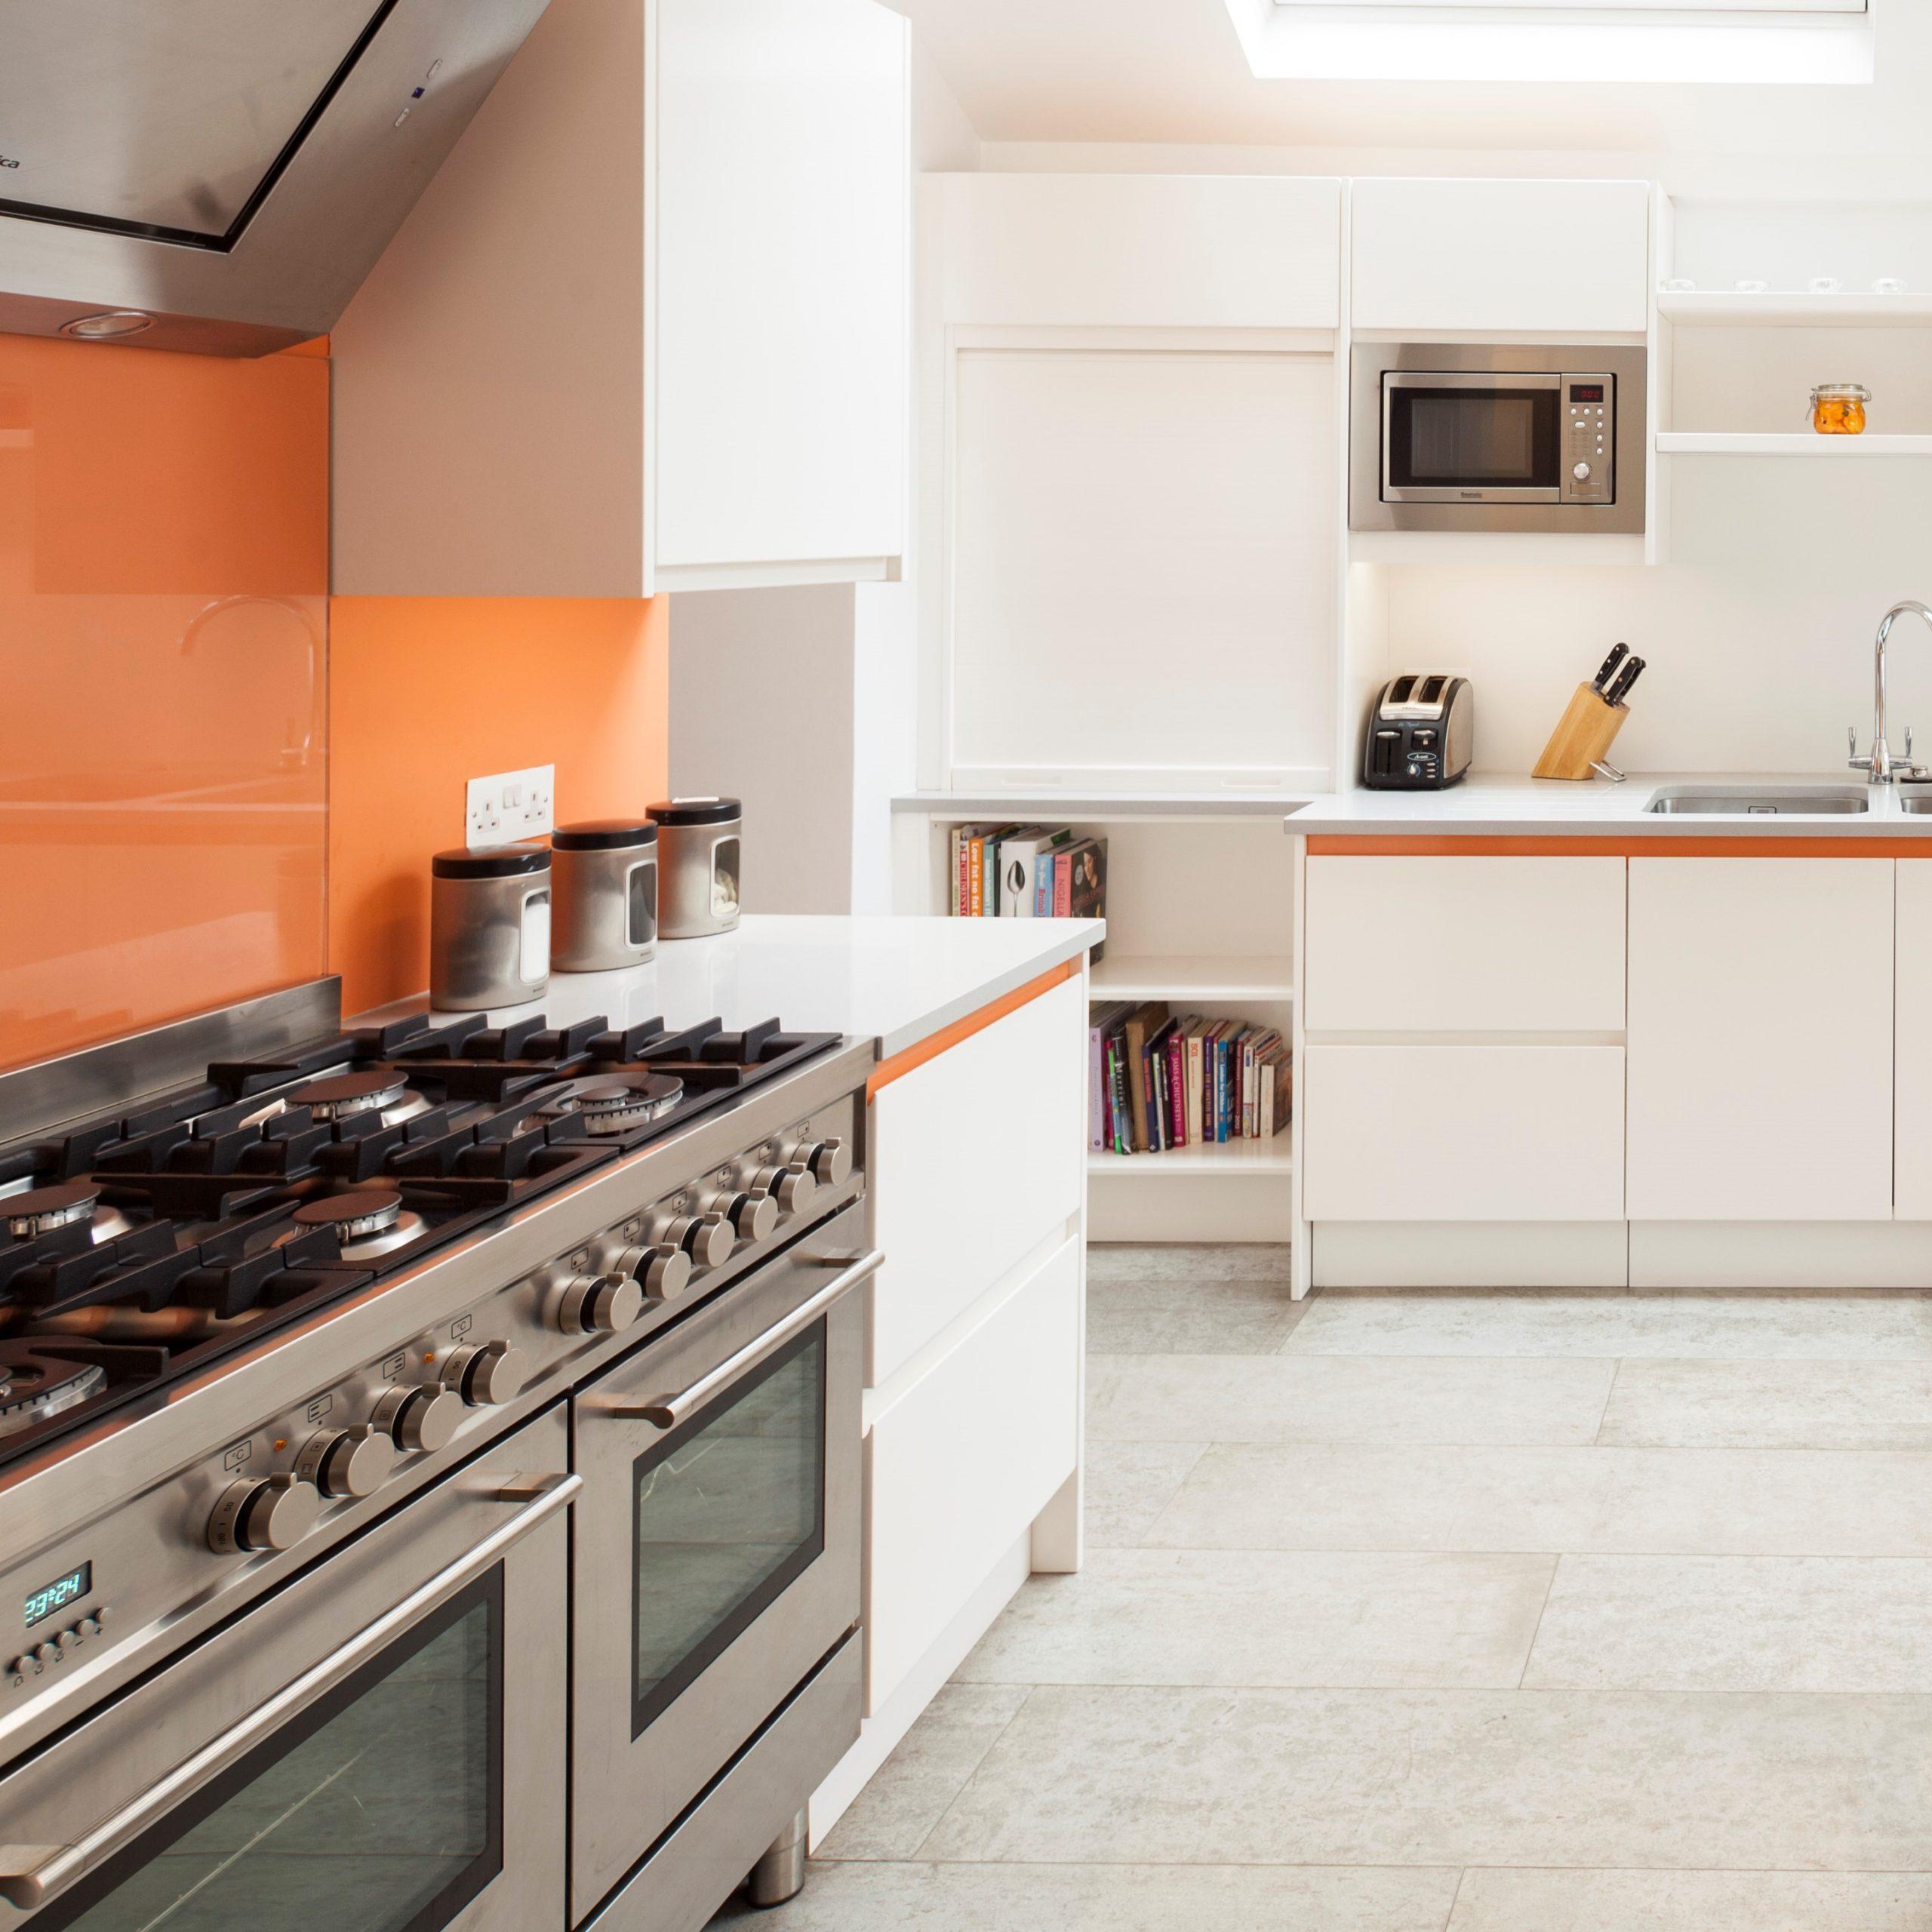 rjv-home-design-refurbishment-london-5f2136a5b70e7